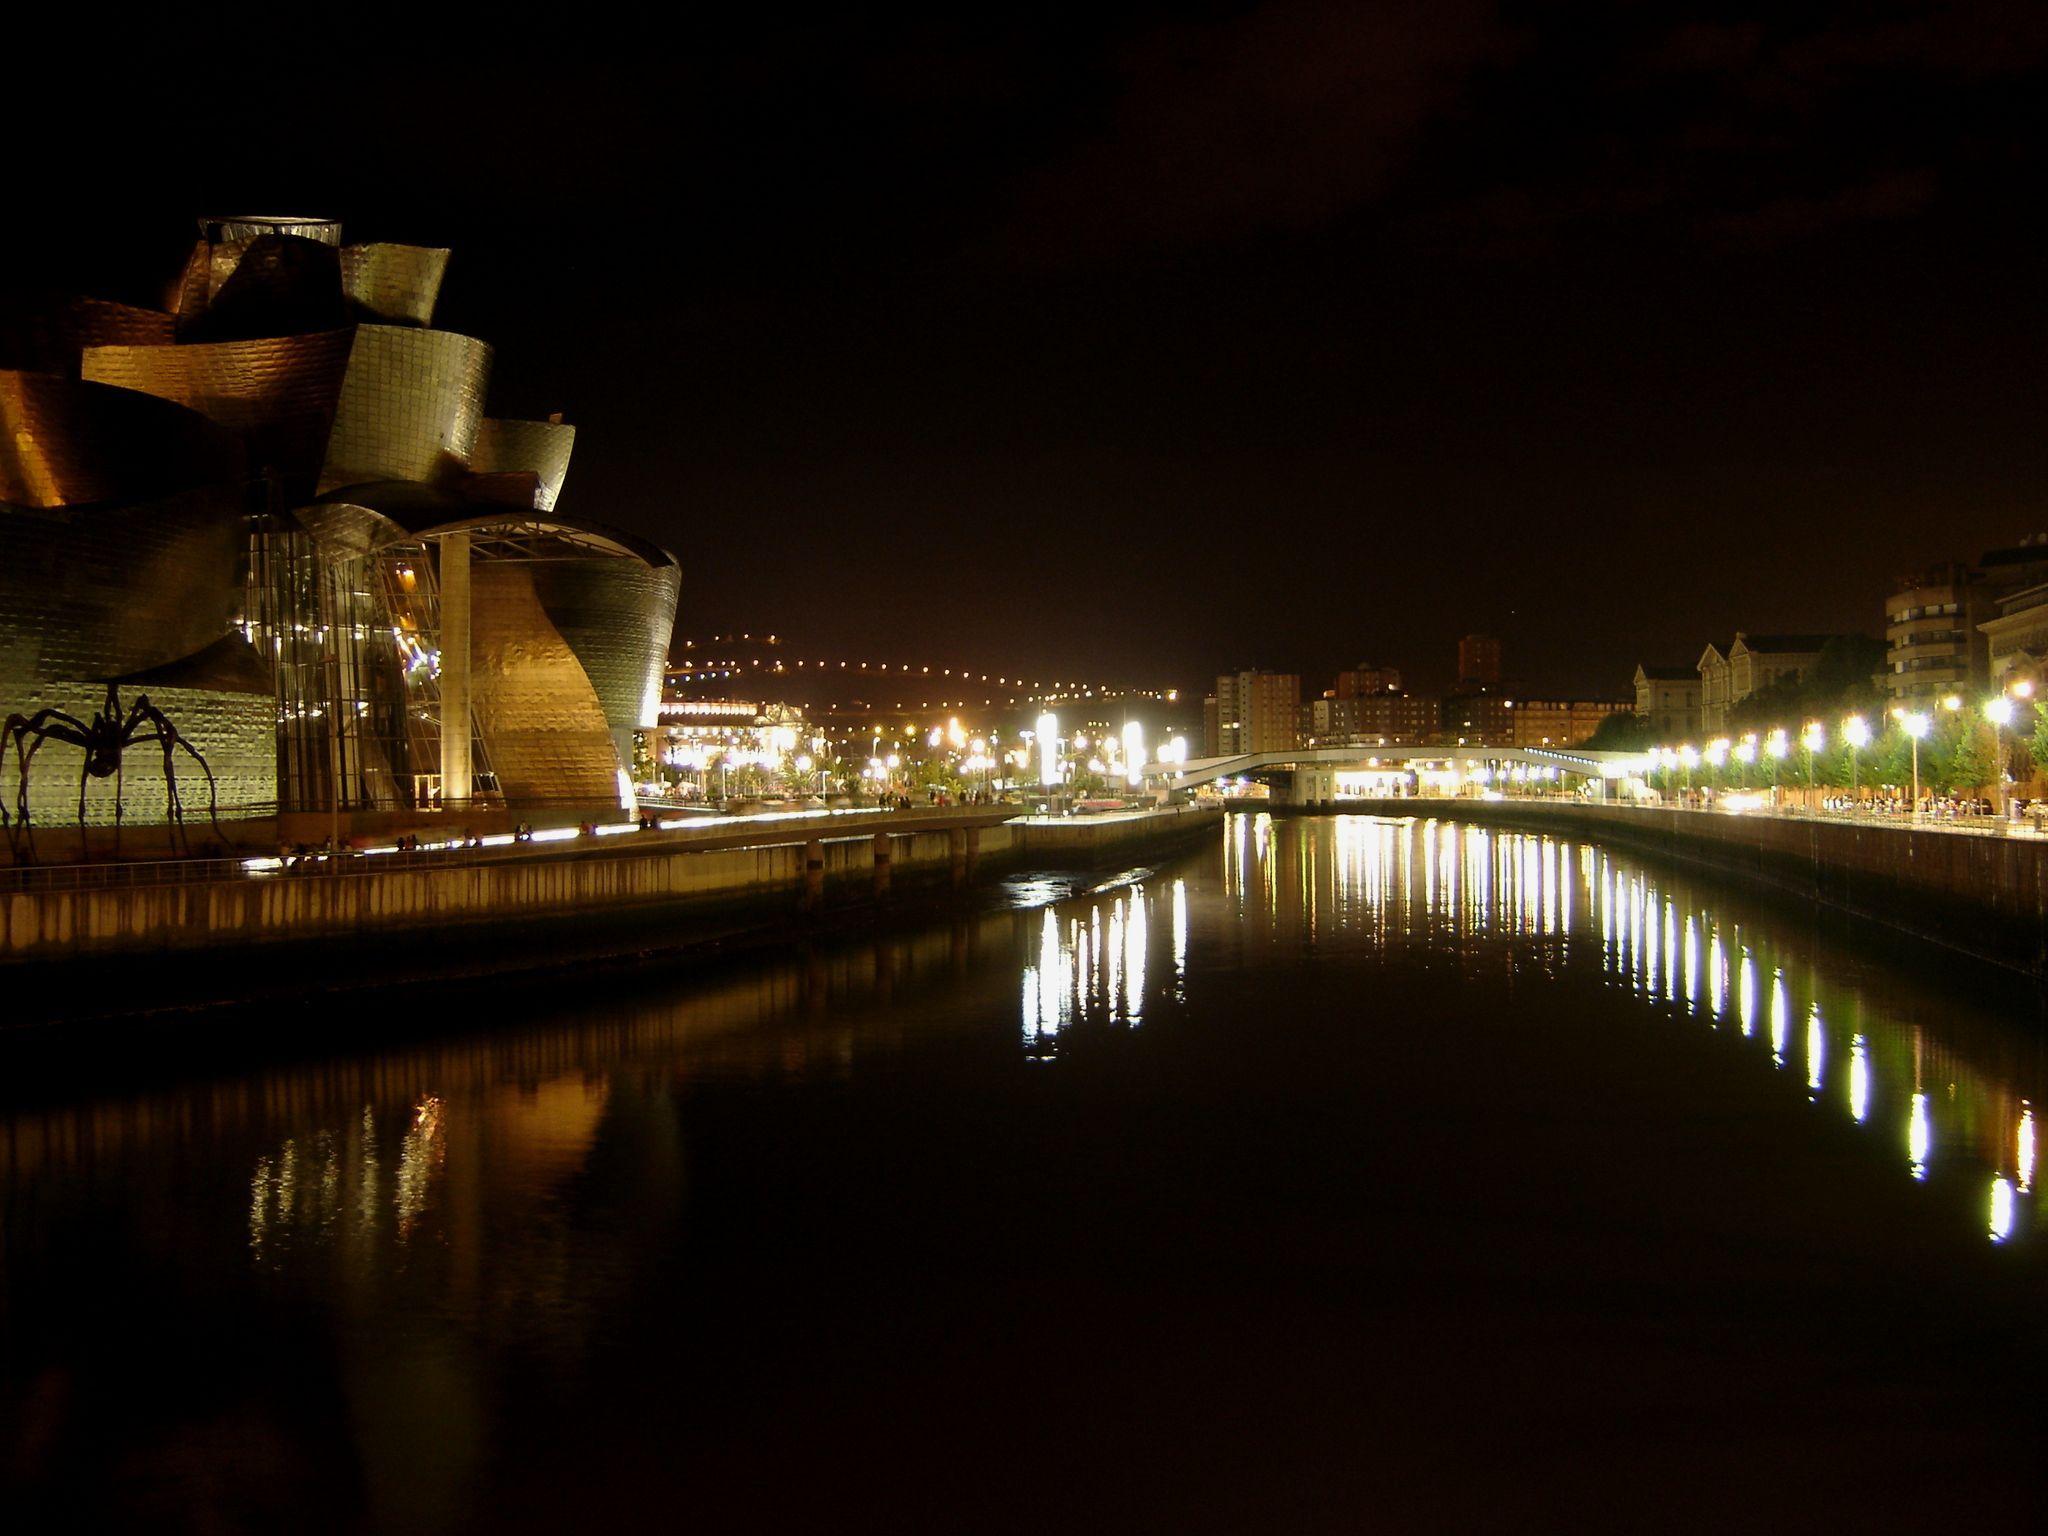 Bilbao nocturno fotos de fotos de bilbao - Iluminacion bilbao ...